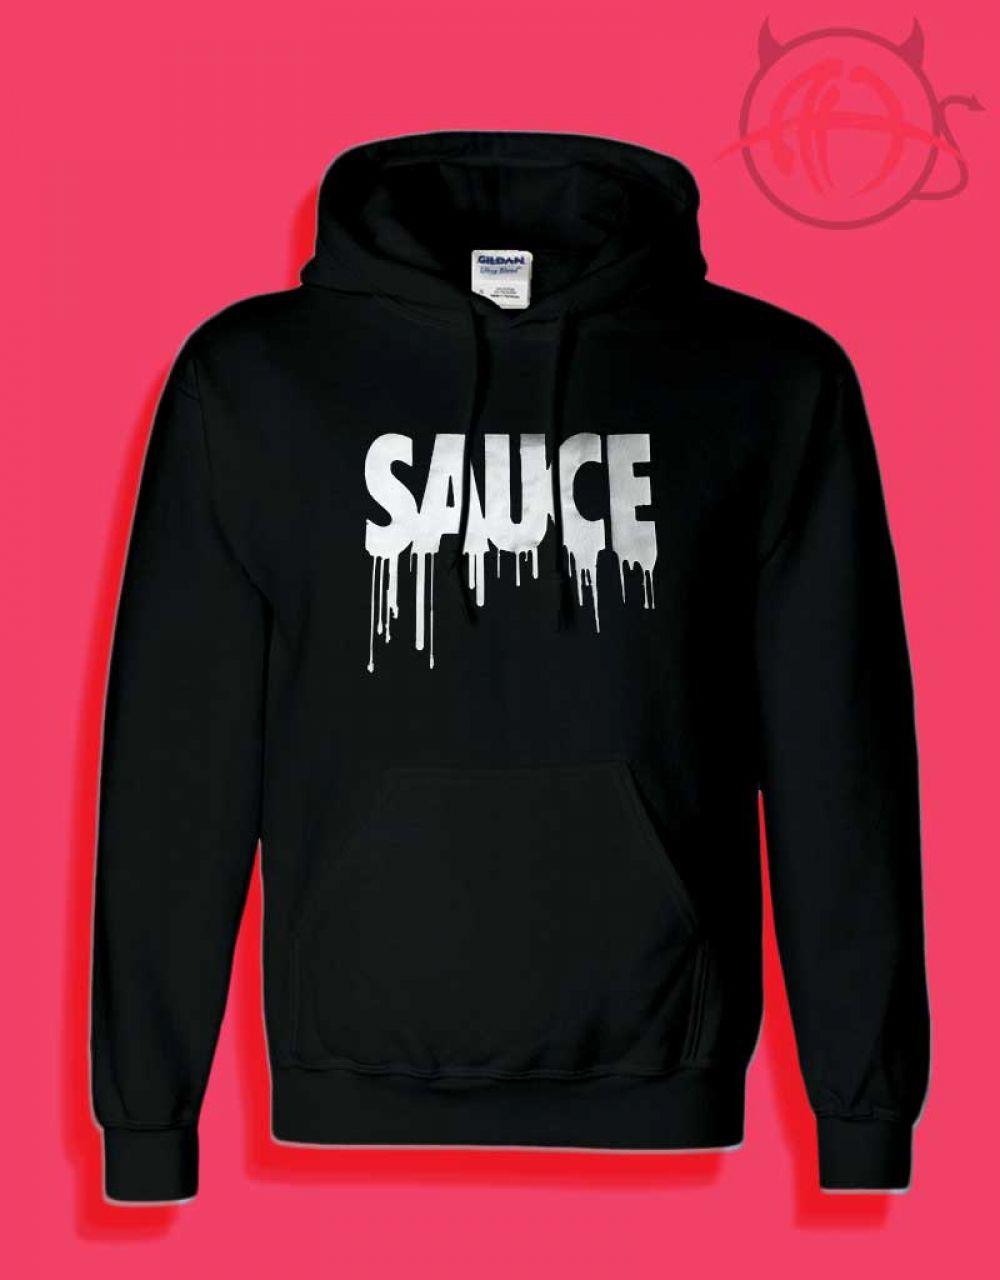 f60ded0b8320 Cheap Custom Sauce Hoodies $ 33.50 #Tee #Hype #Outfits #Outfit #Hypebeast #  fashion #shirt #Tees #Tops #Teen